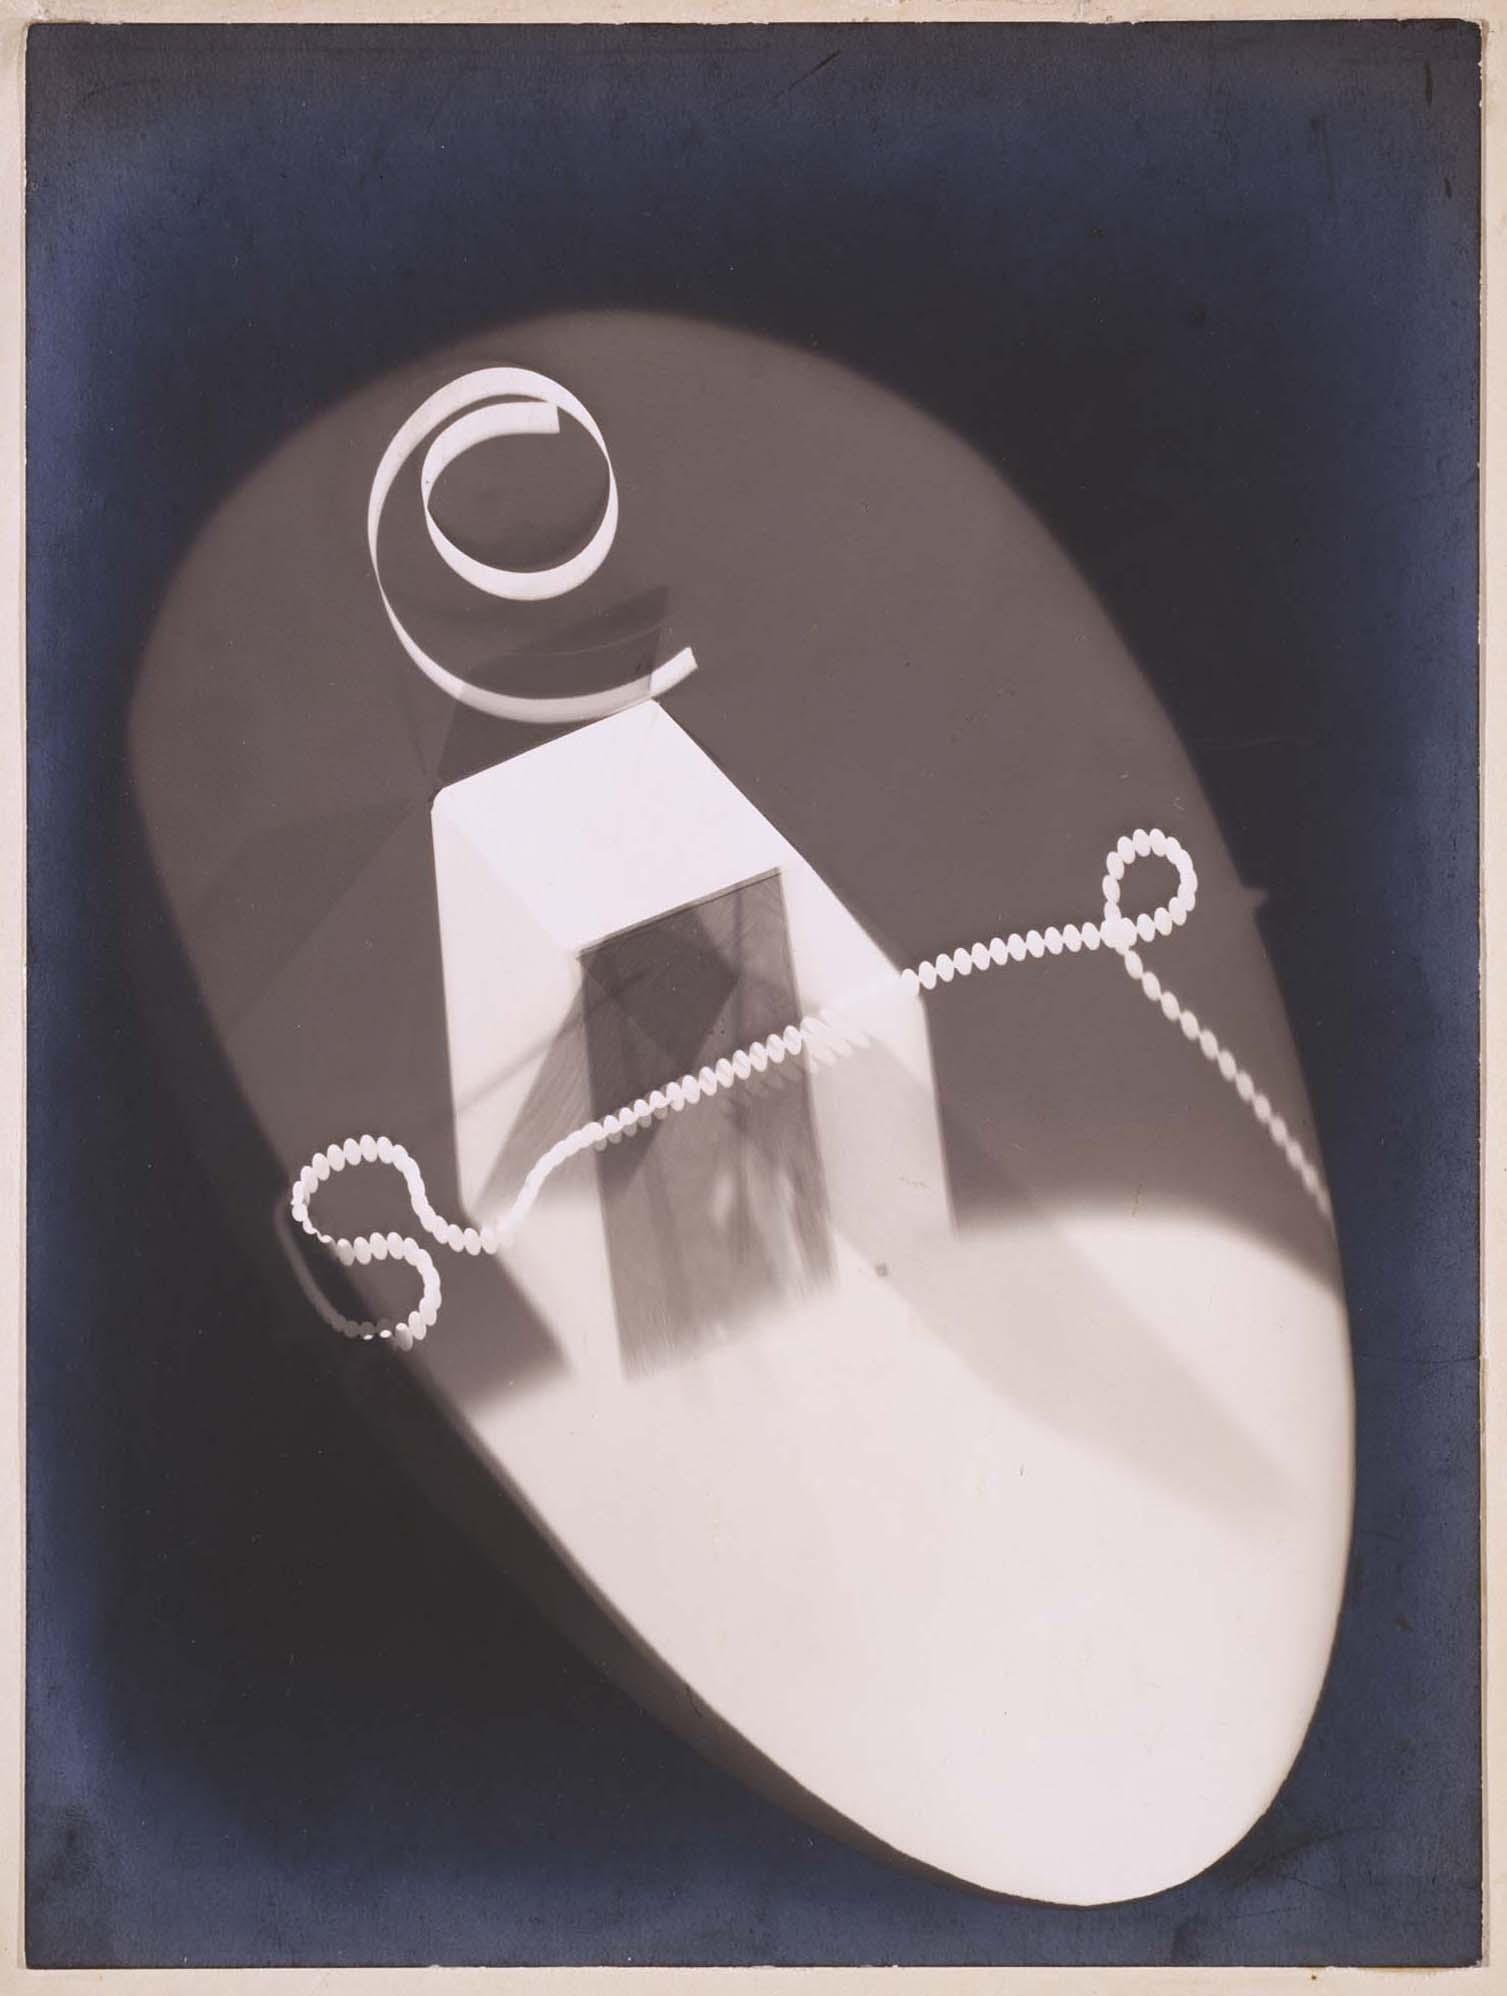 Man Ray on ArtStack - art online